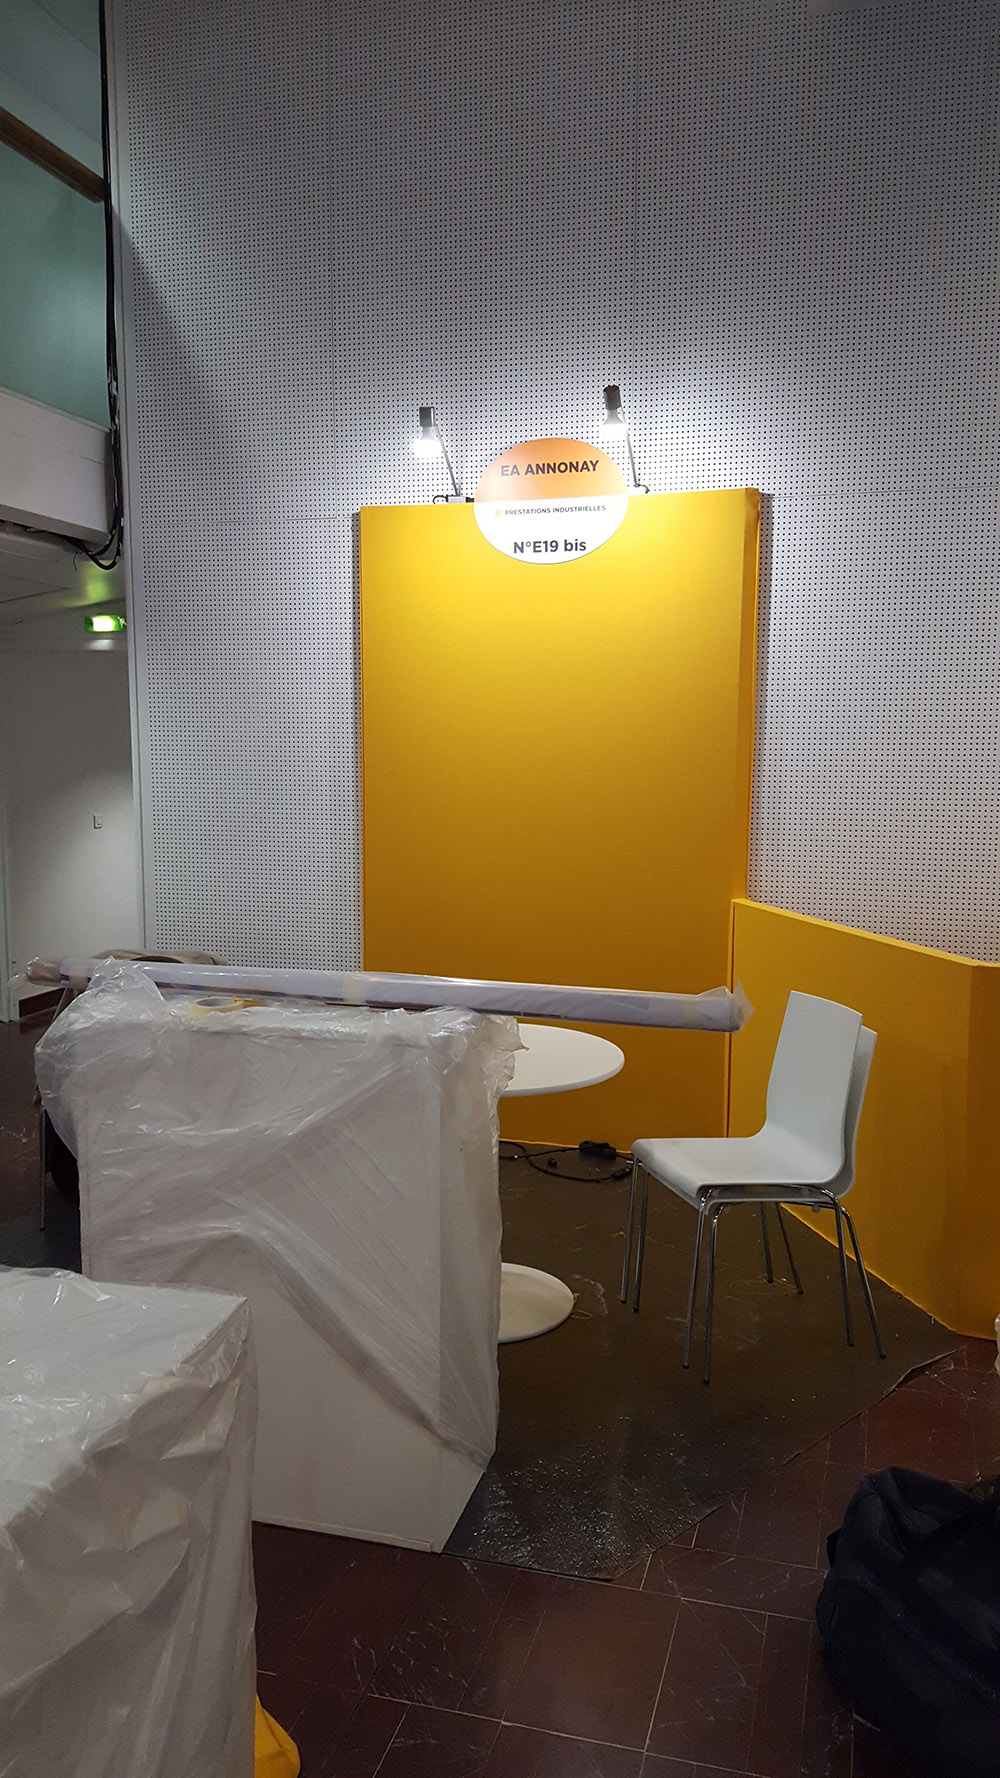 salon-handicap-entreprise-adaptee-annonay-44